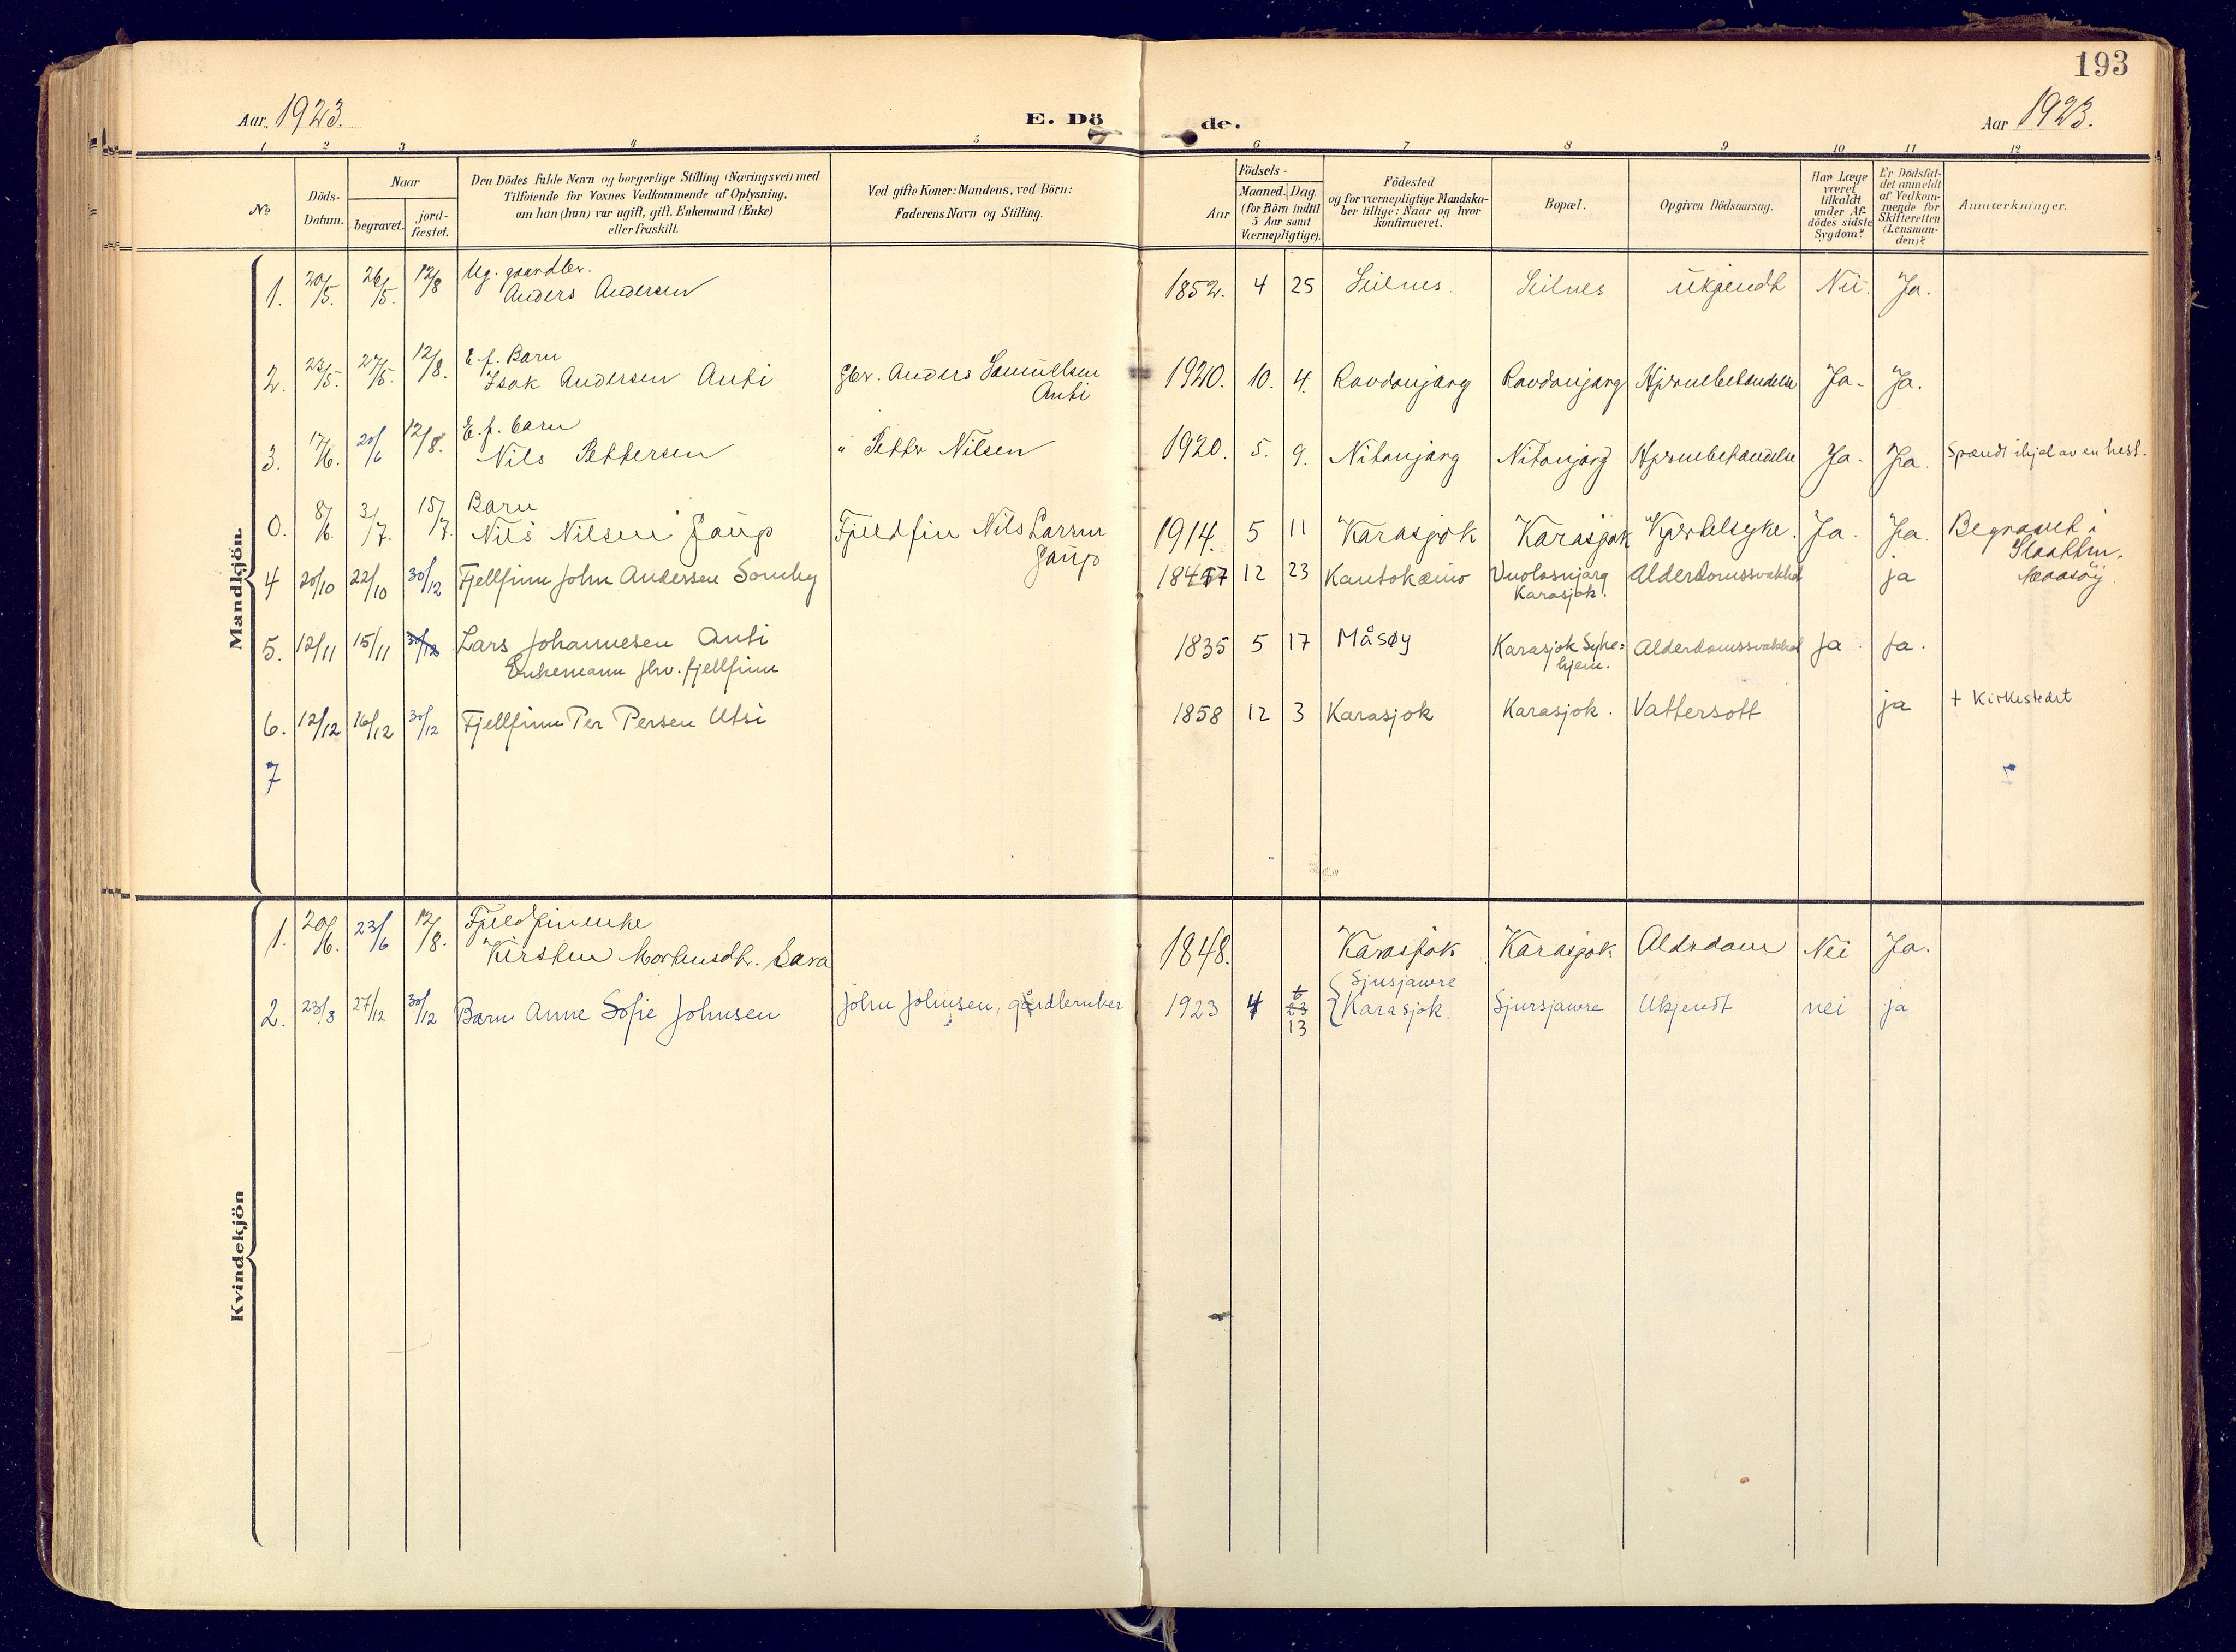 SATØ, Karasjok sokneprestkontor, H/Ha: Ministerialbok nr. 3, 1907-1926, s. 193